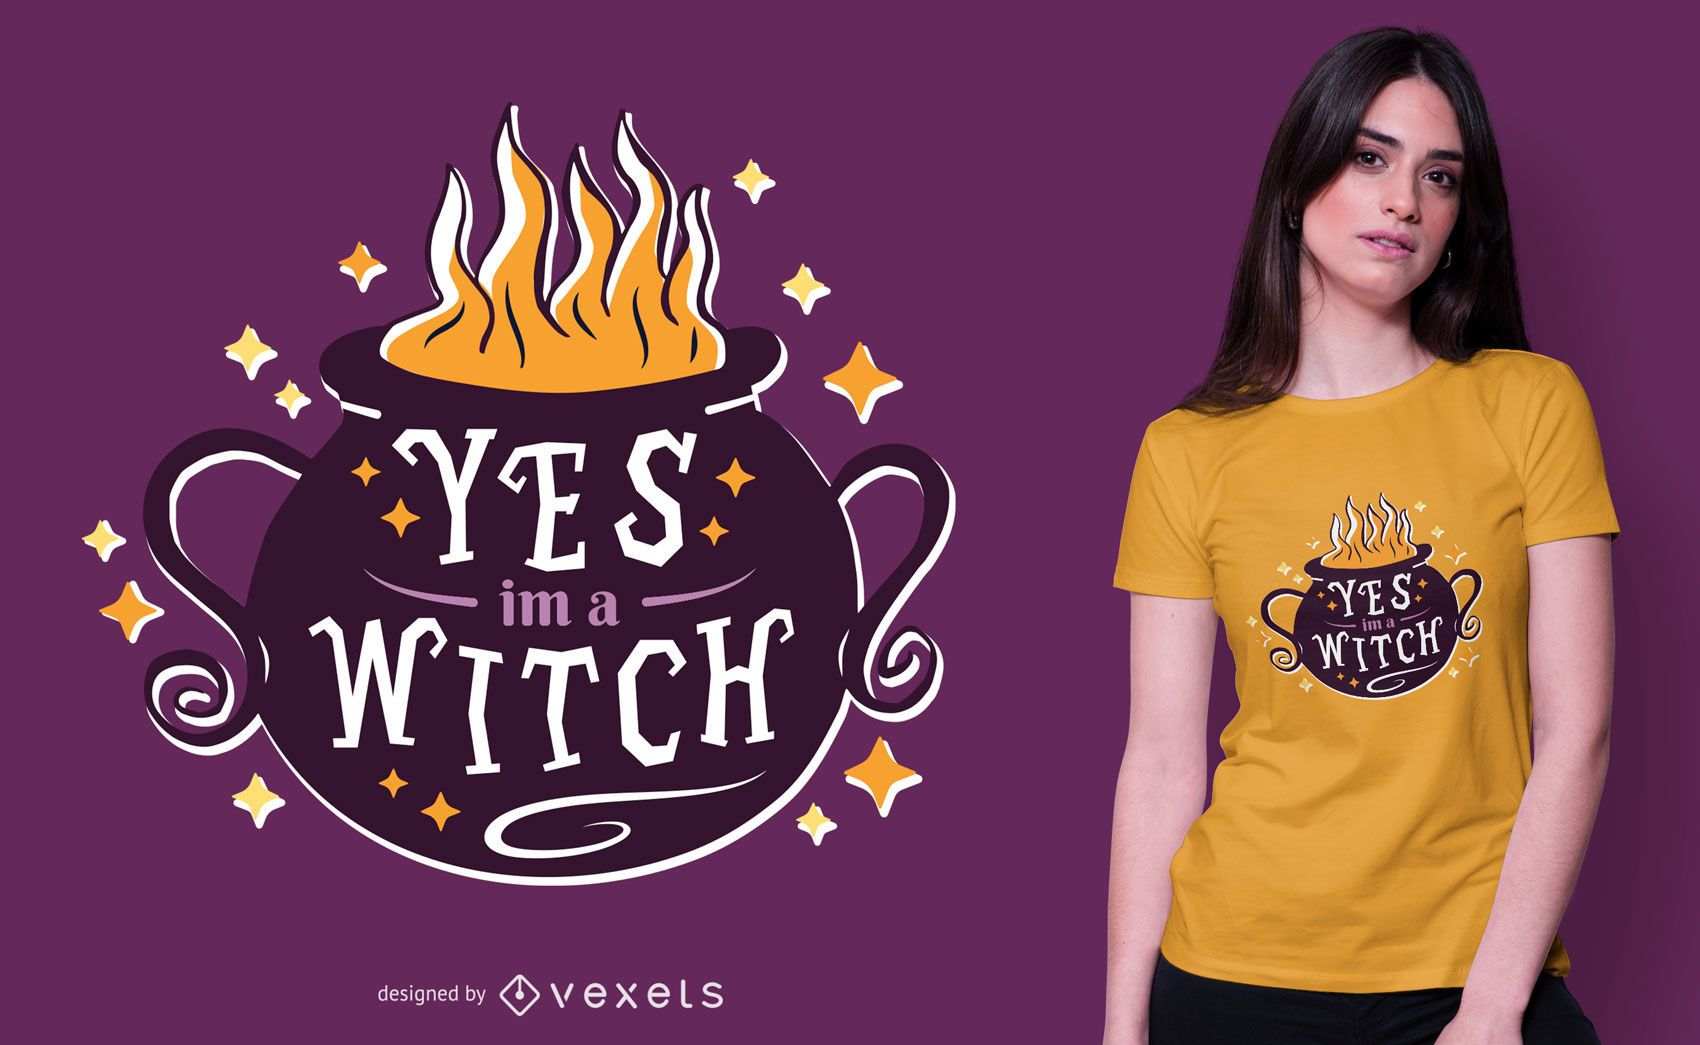 I'm a witch t-shirt design